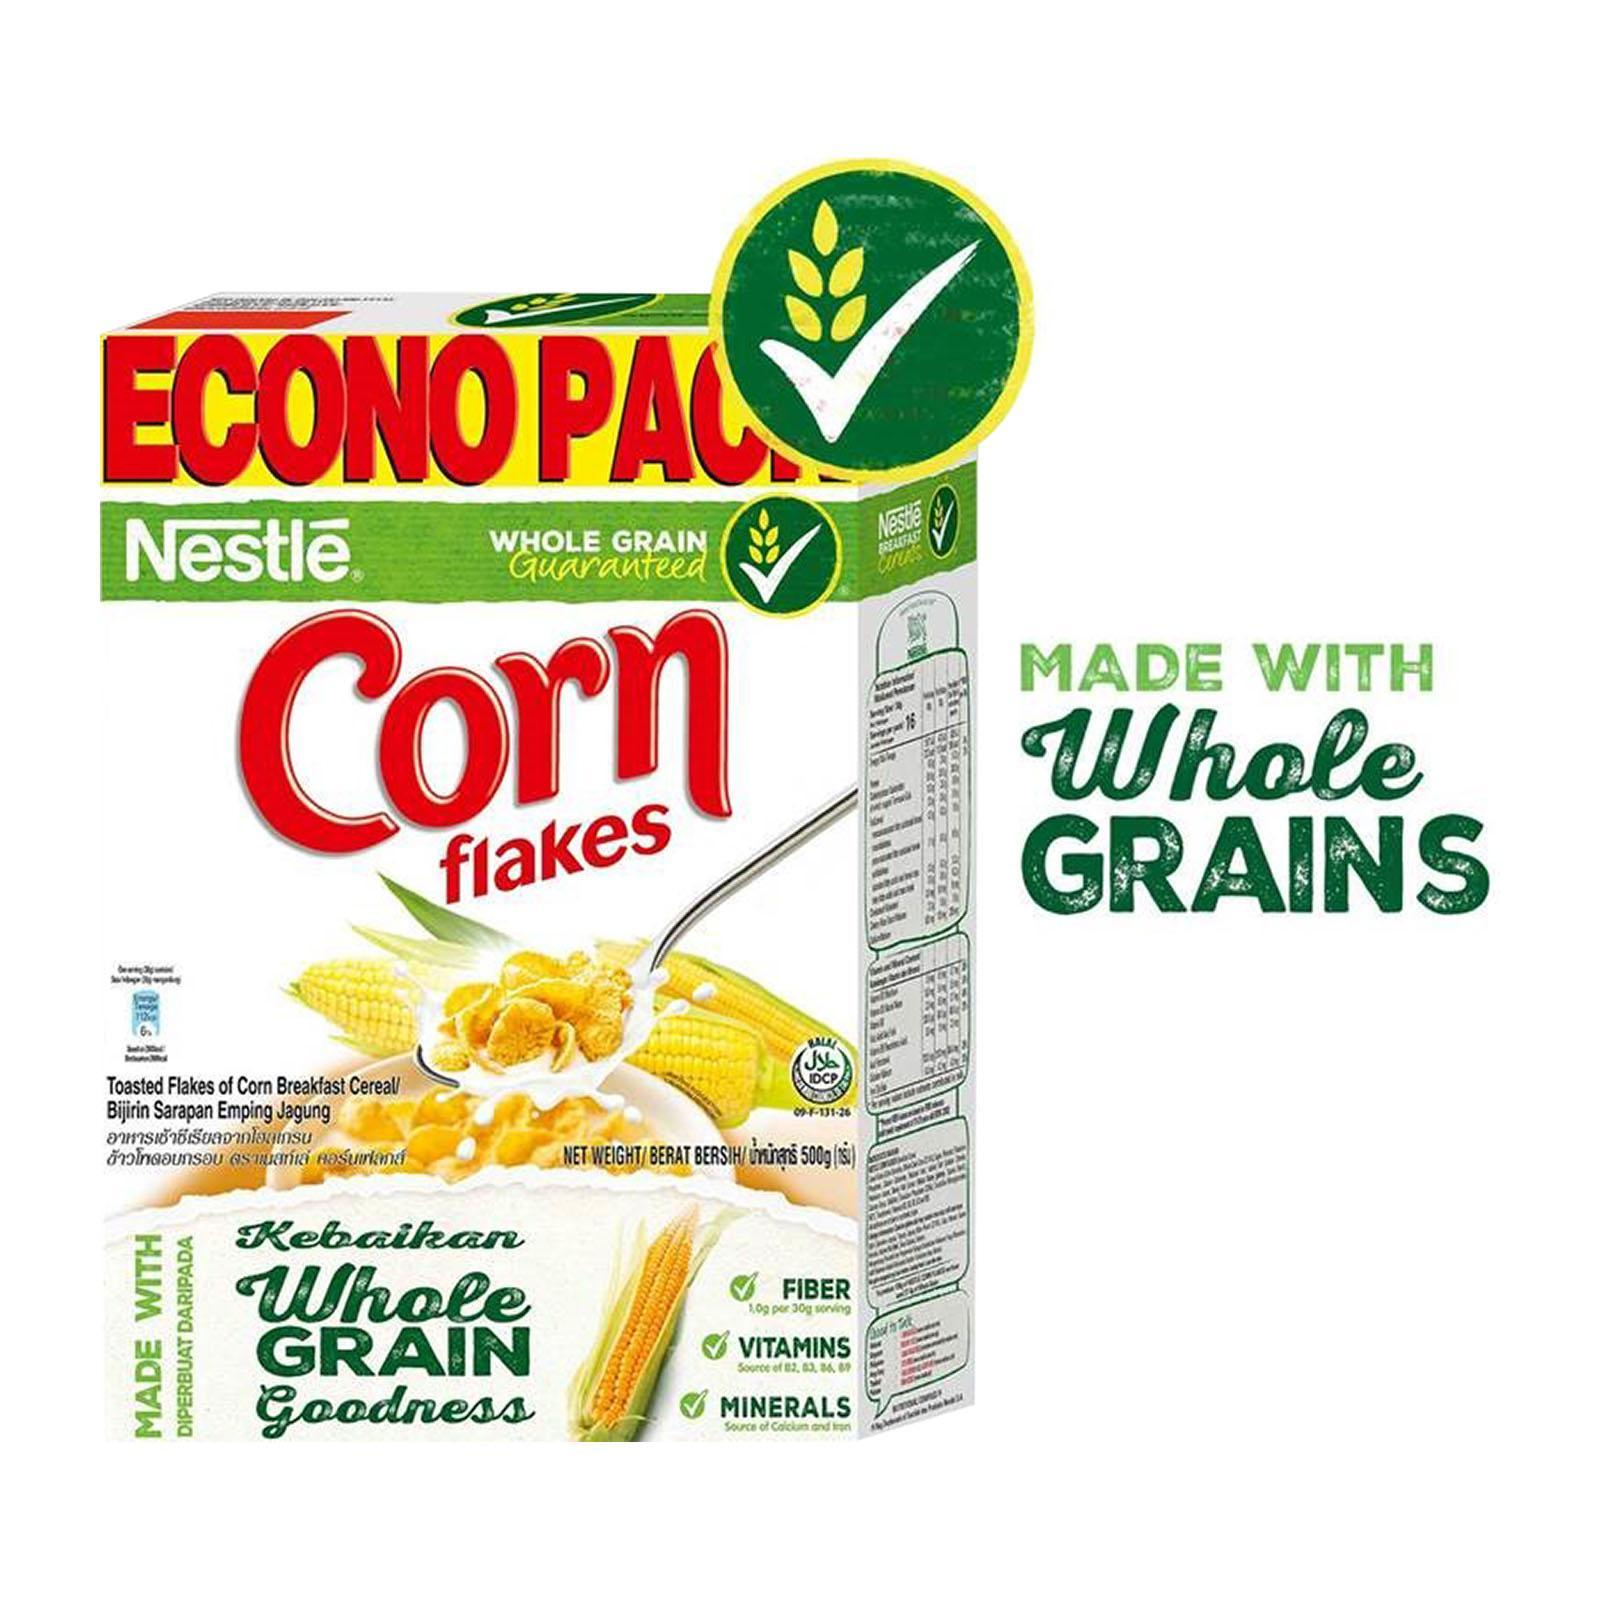 NESTLE Cornflakes Econo Pack Breakfast Cereal